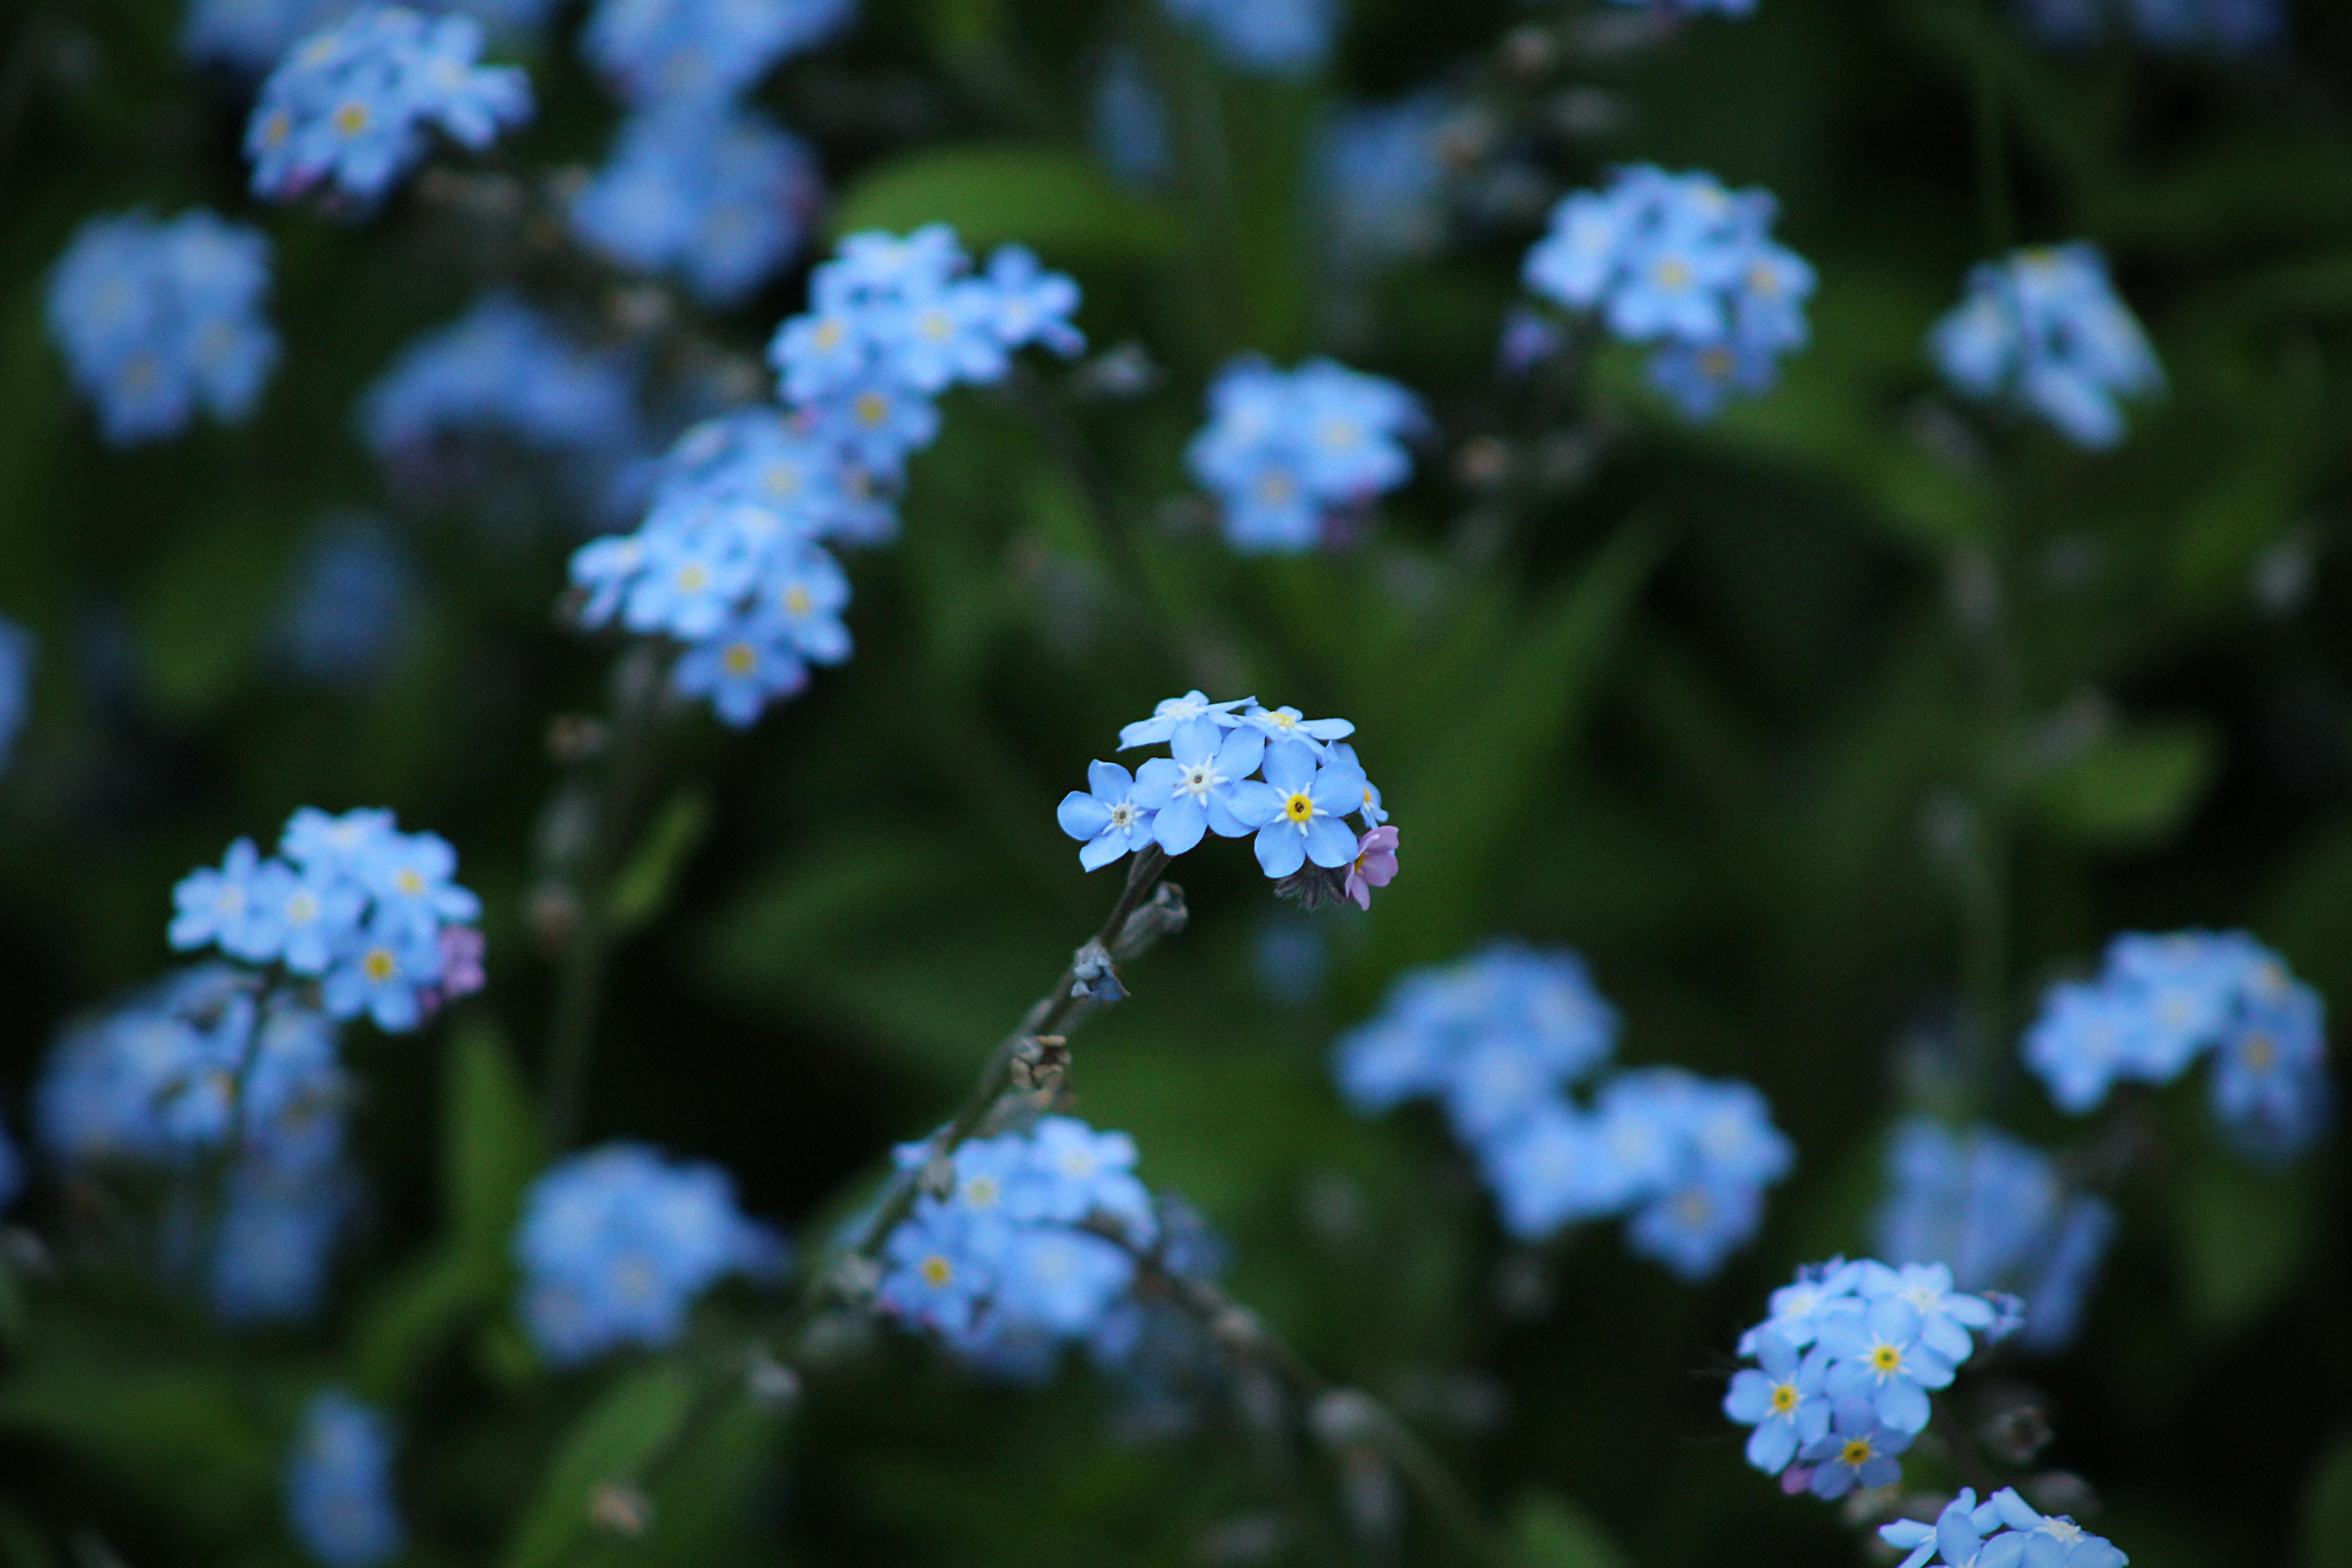 tilt shift photography of blue flowers